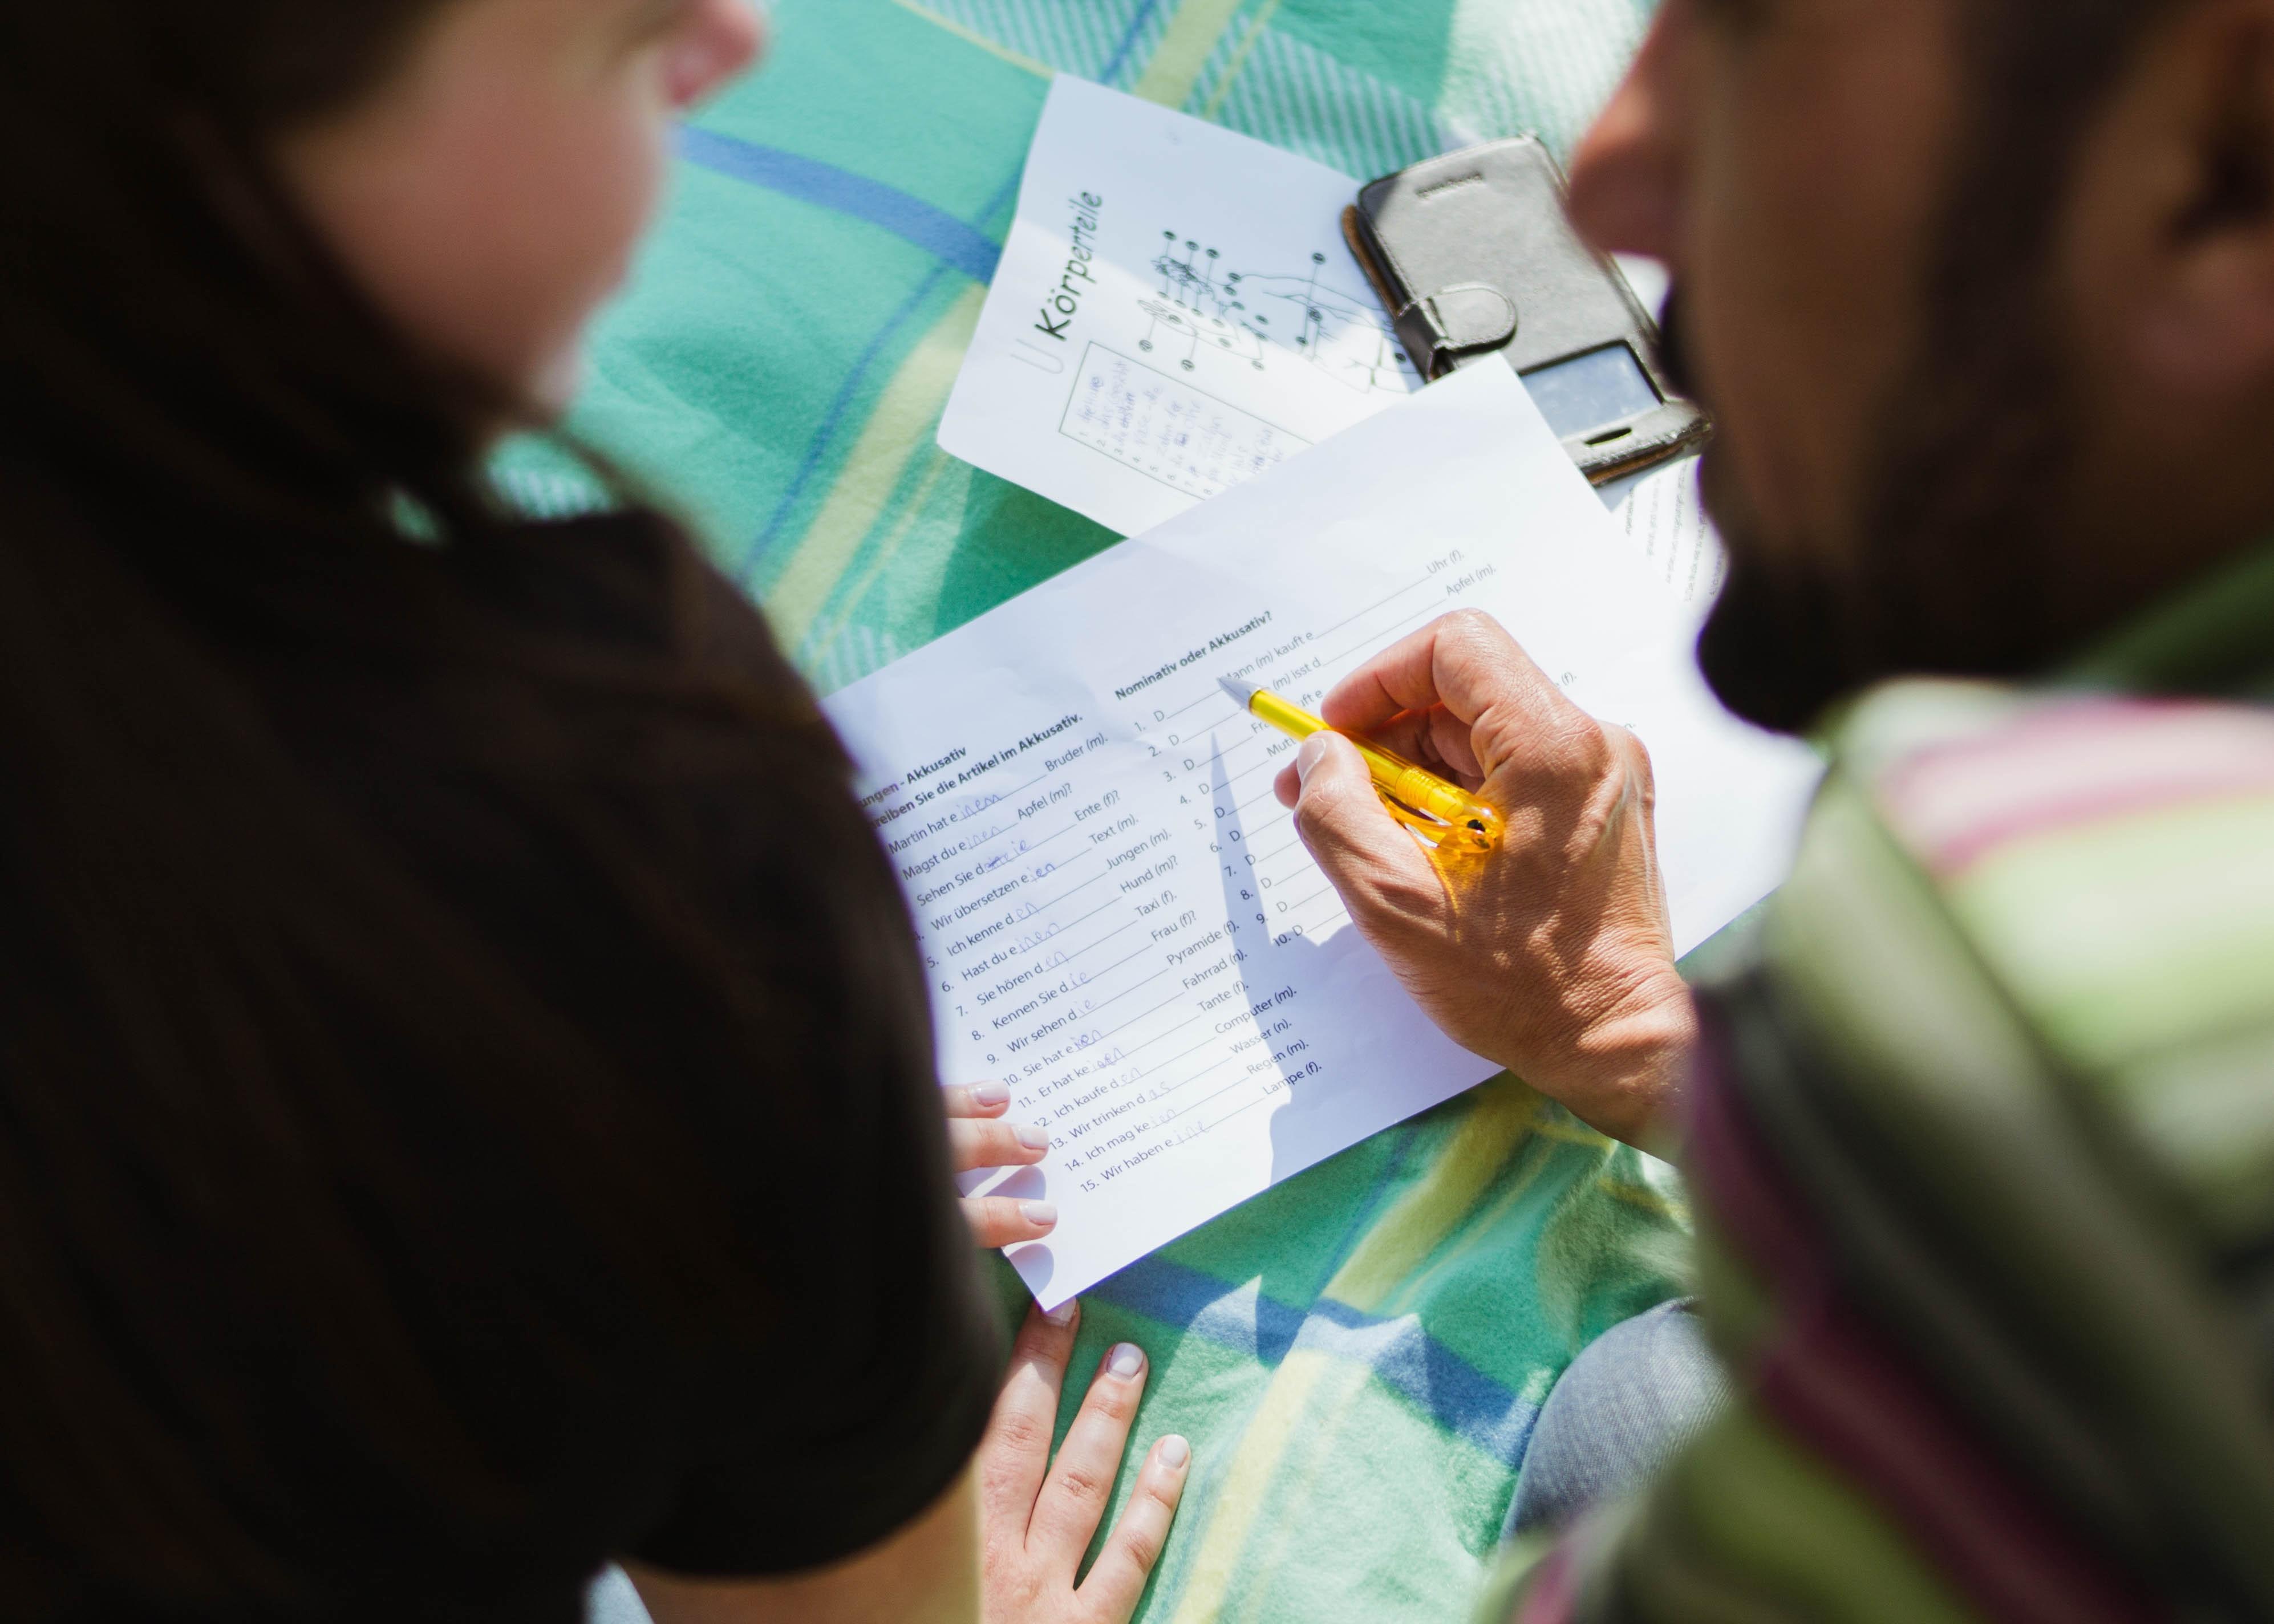 A teacher working with a student. Photo courtesy of Annika Gordon on Unsplash.